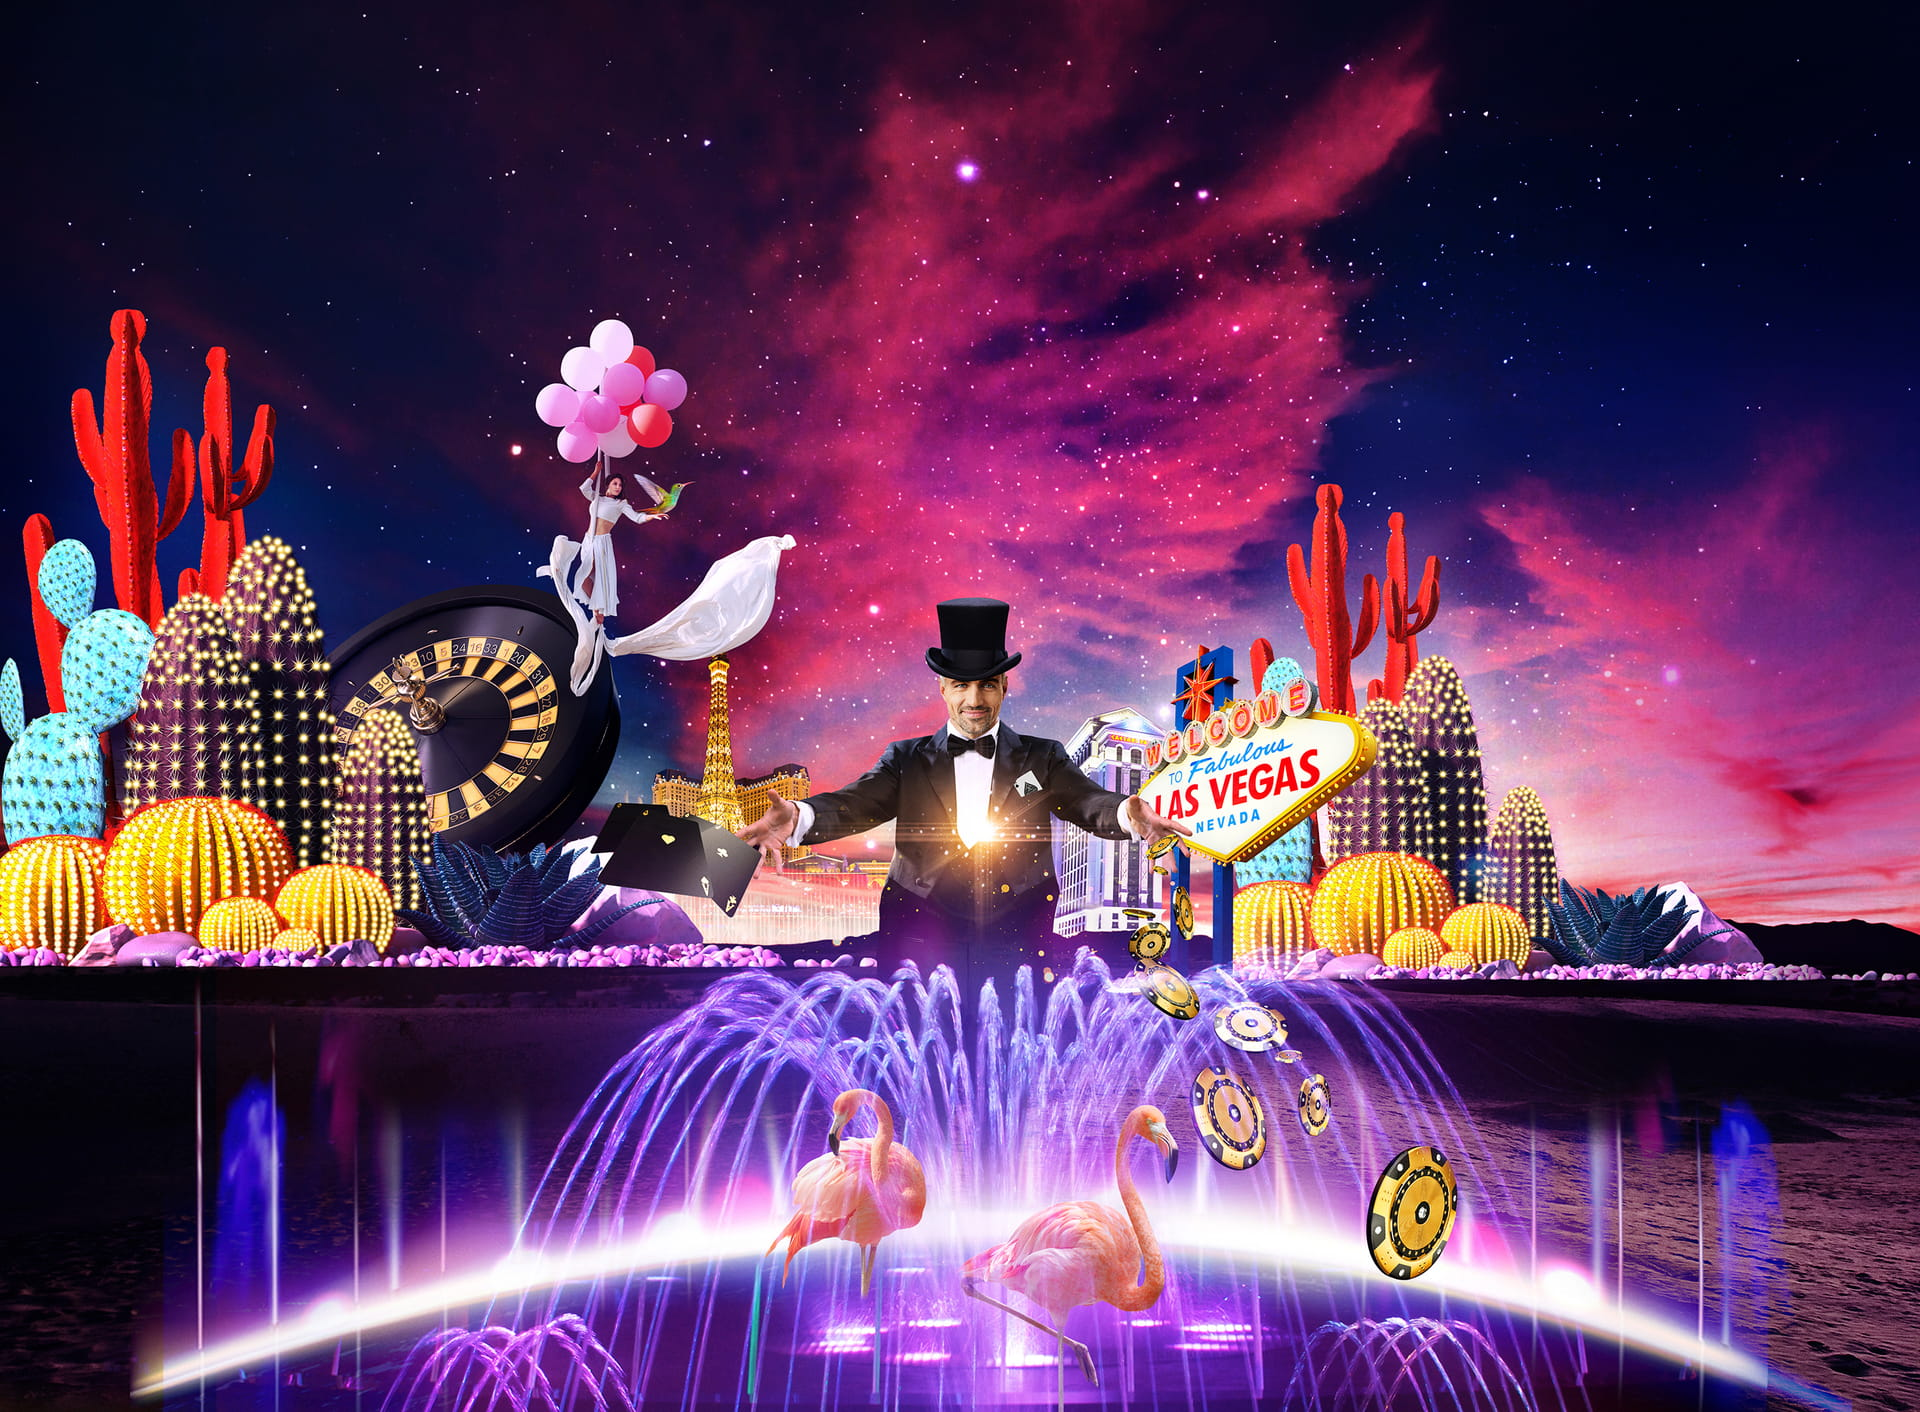 Las Vegas kommt ins Grand Casino Bern